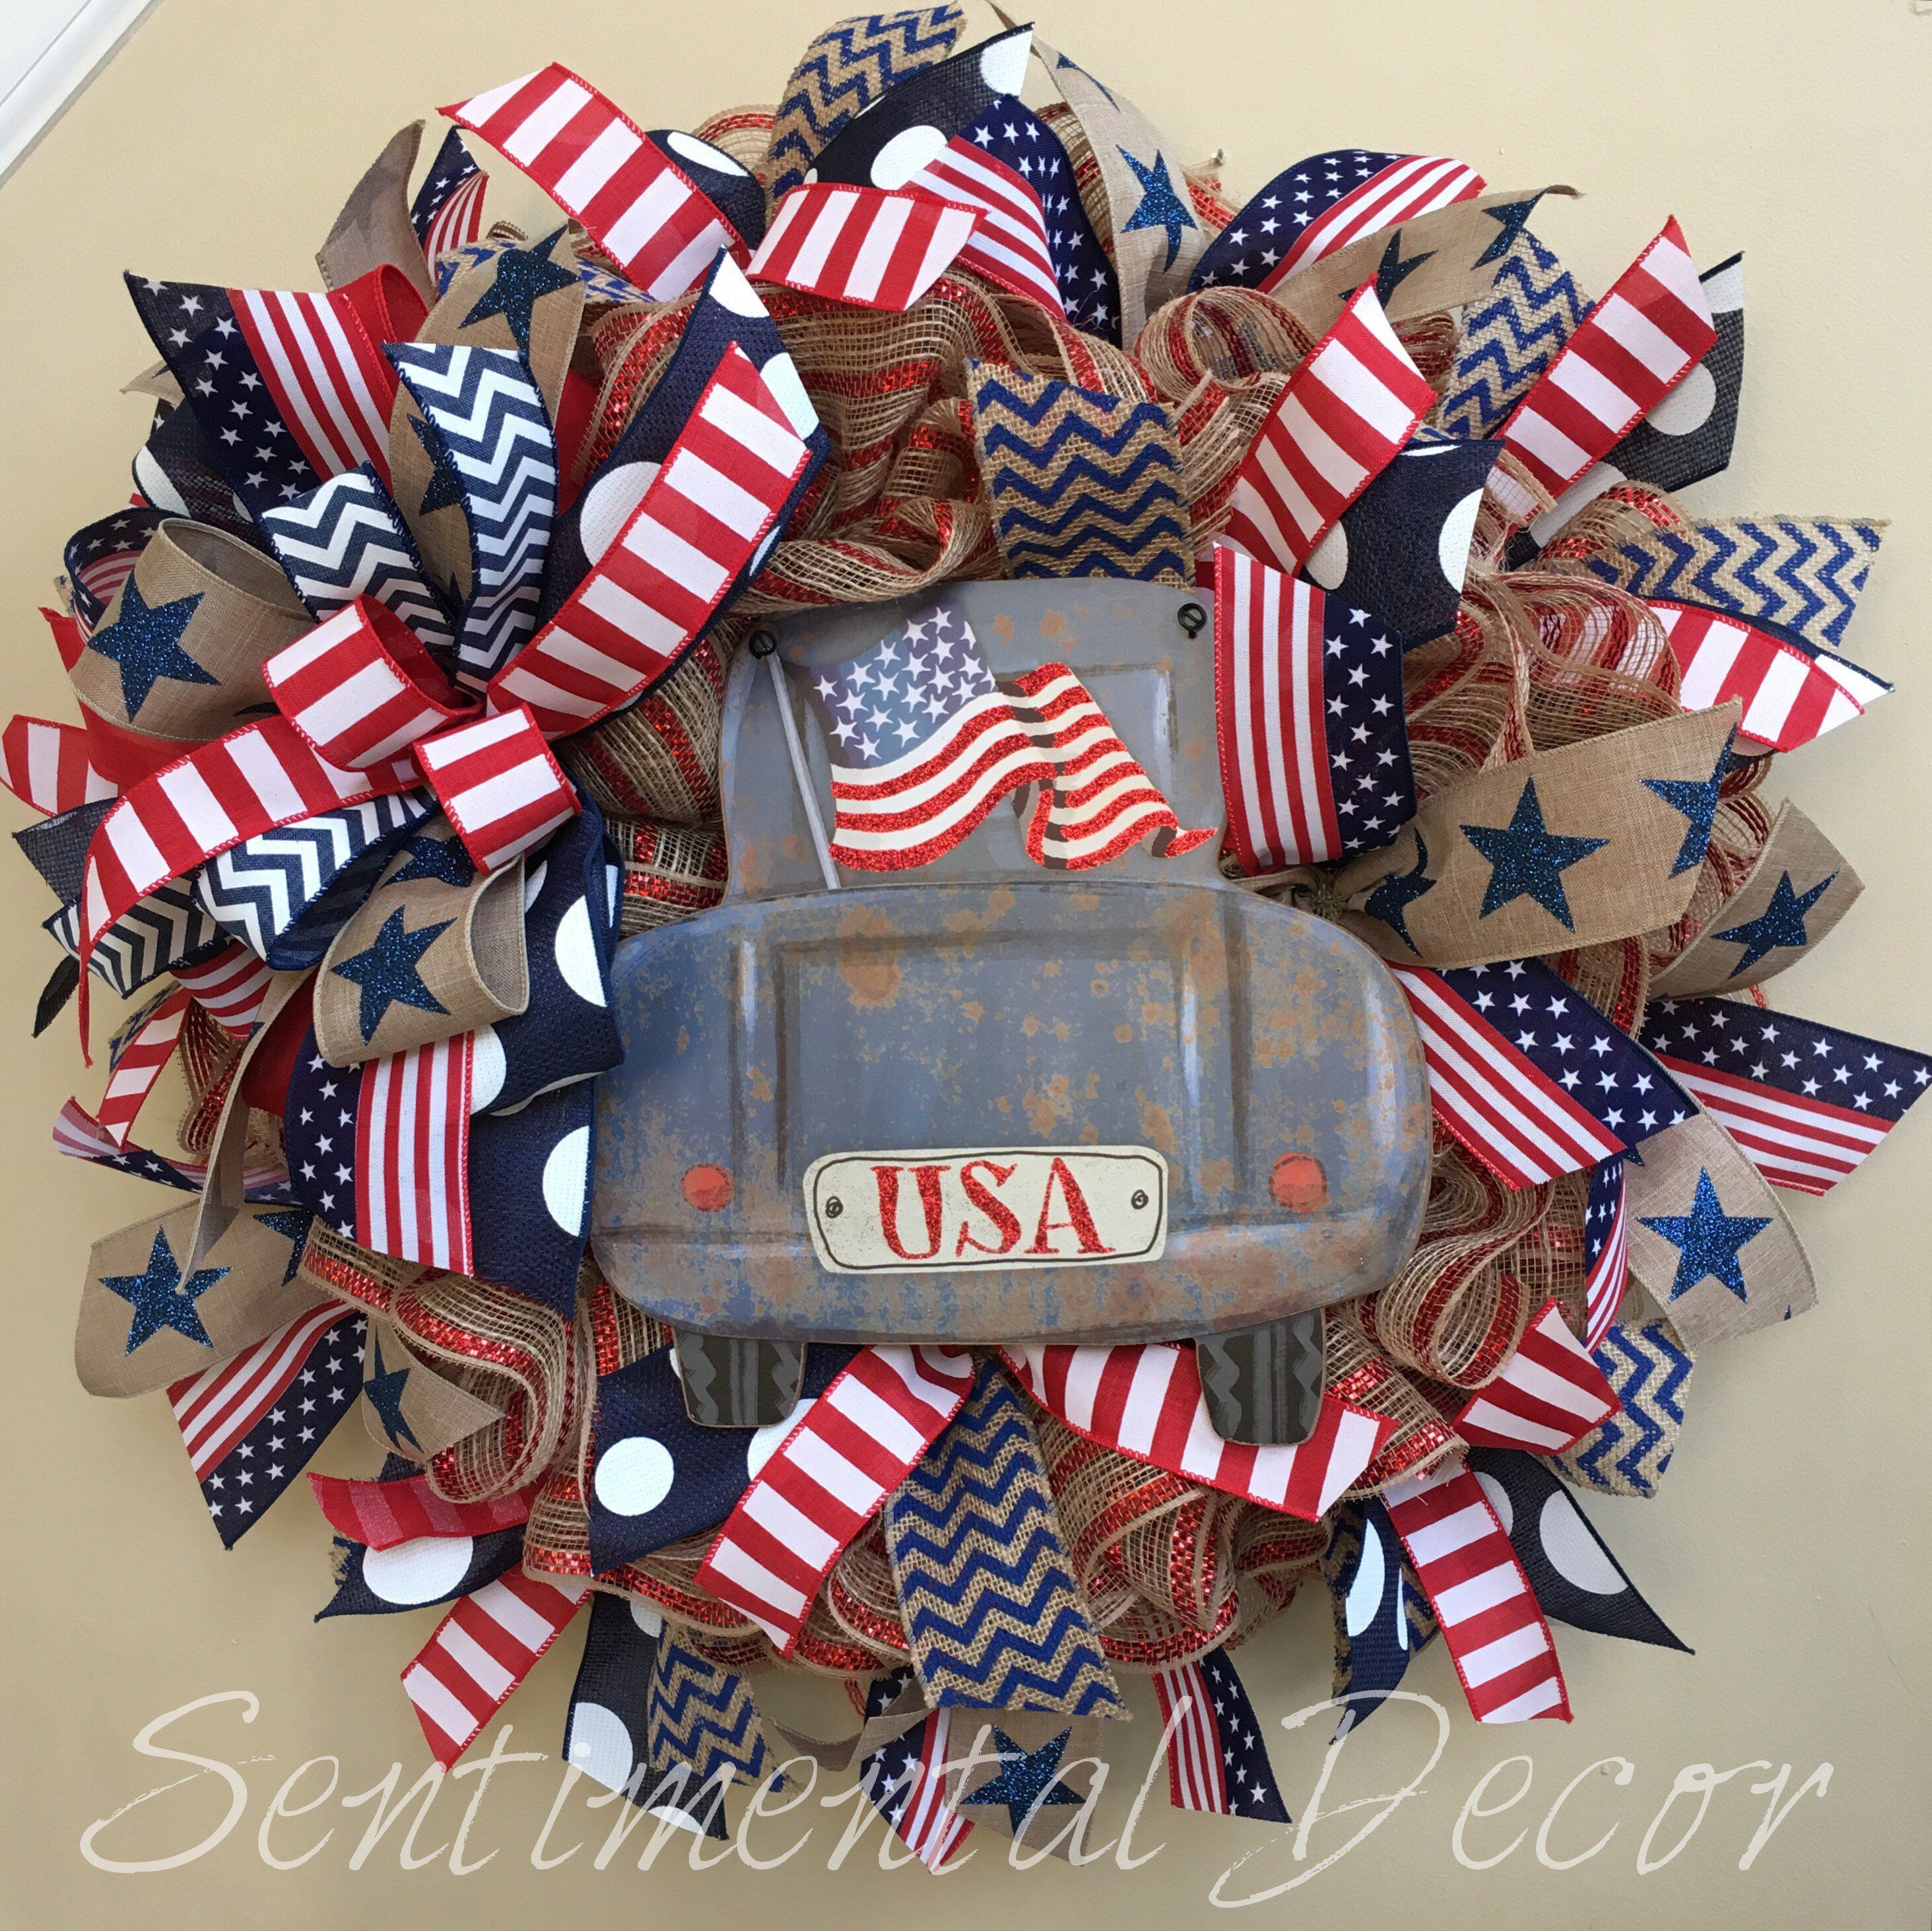 Americana Mesh Wreath Patriotic Truck Truck Wreath Memorial Day Wreath Fourth of July Wreath Patriotic Wreath USA Mesh Wreath